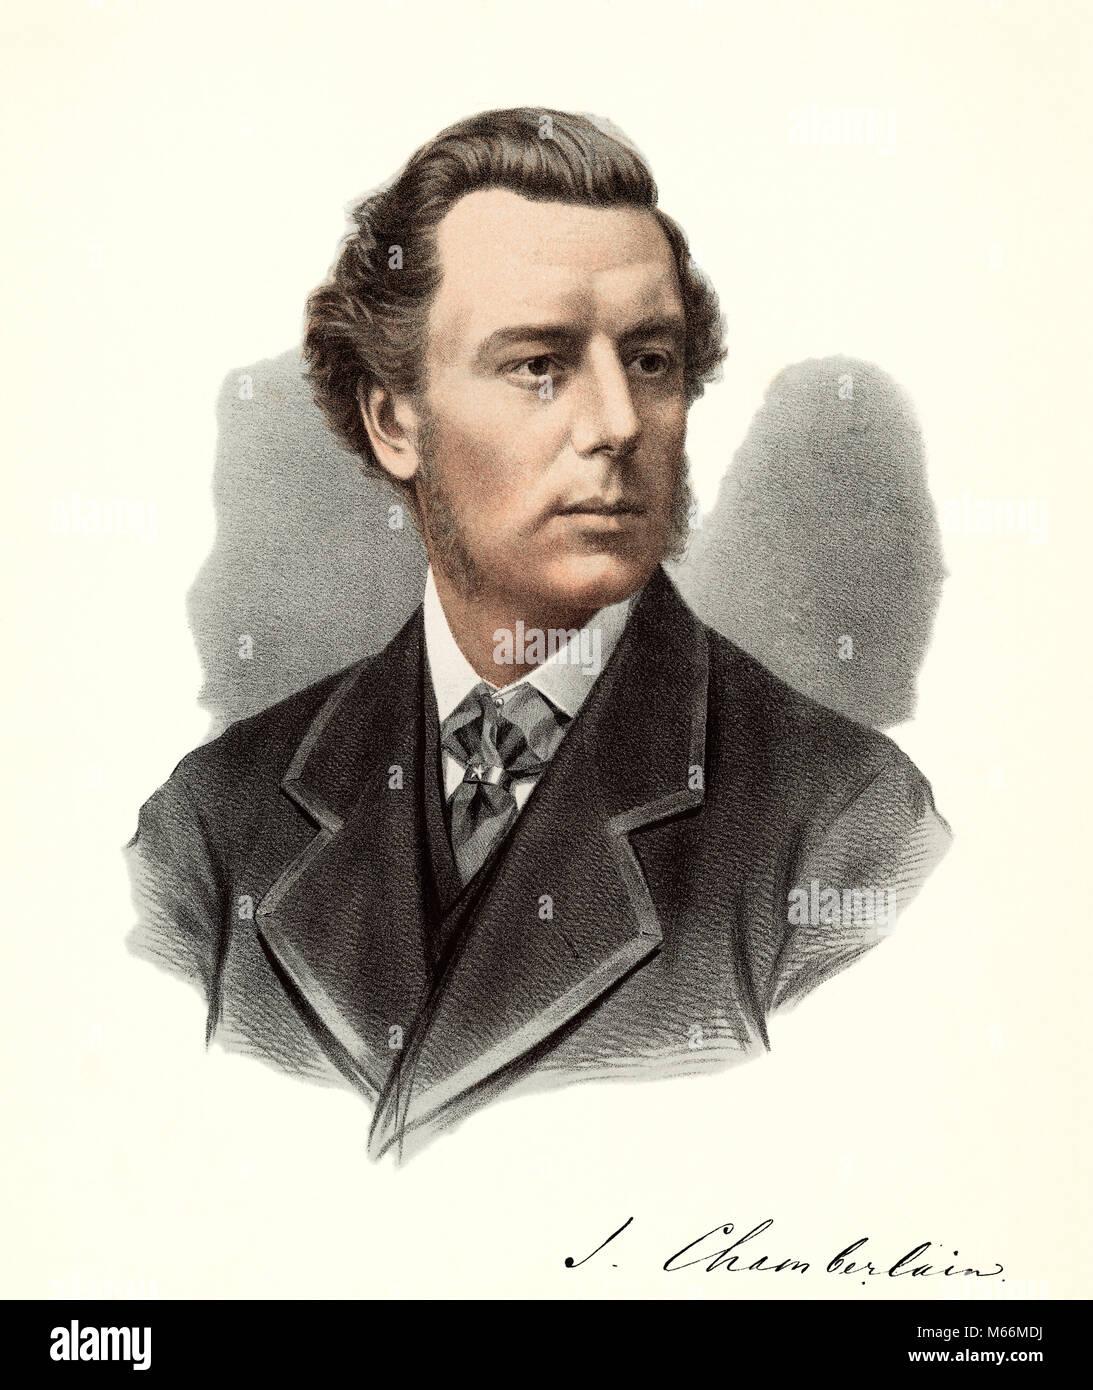 1800s 1880s 1890s JOSEPH CHAMBERLAIN BRITISH IMPERIALIST STATESMAN COLONIAL SECRETARY DURING BOER WAR - kh13281 - Stock Image